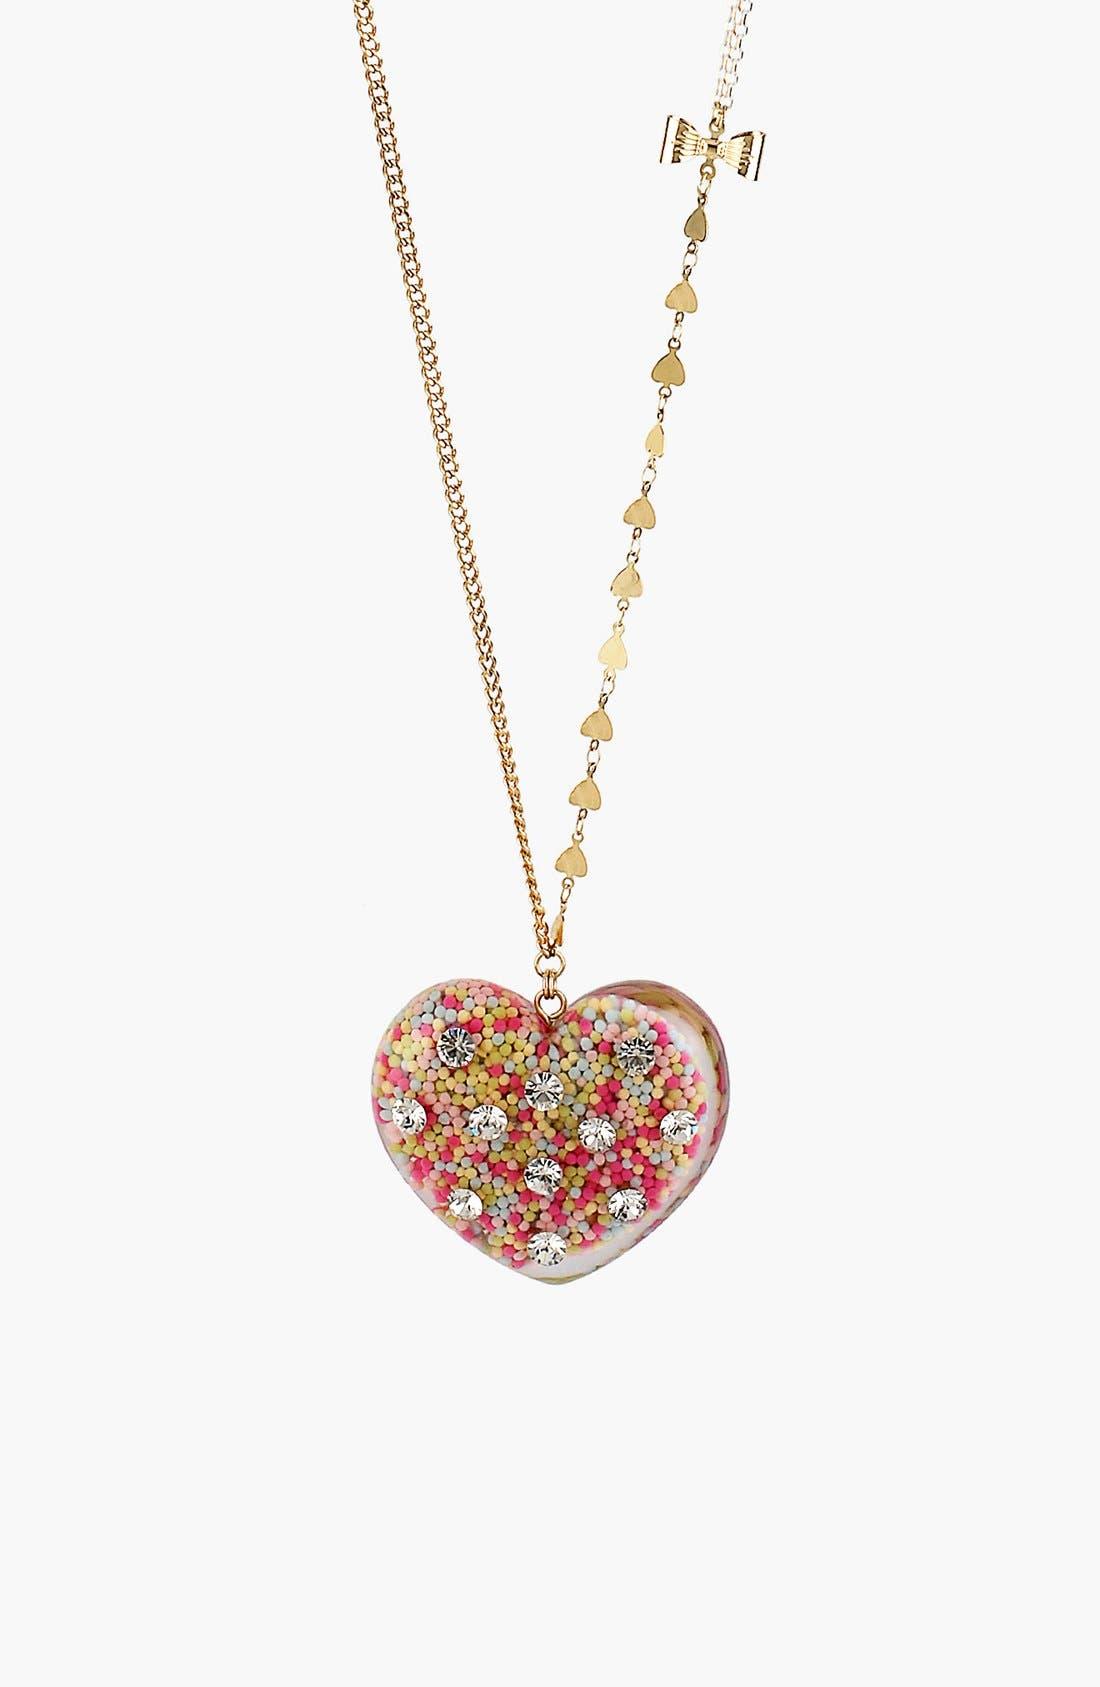 Alternate Image 1 Selected - Betsey Johnson 'Vintage Bow' Long Heart Pendant Necklace